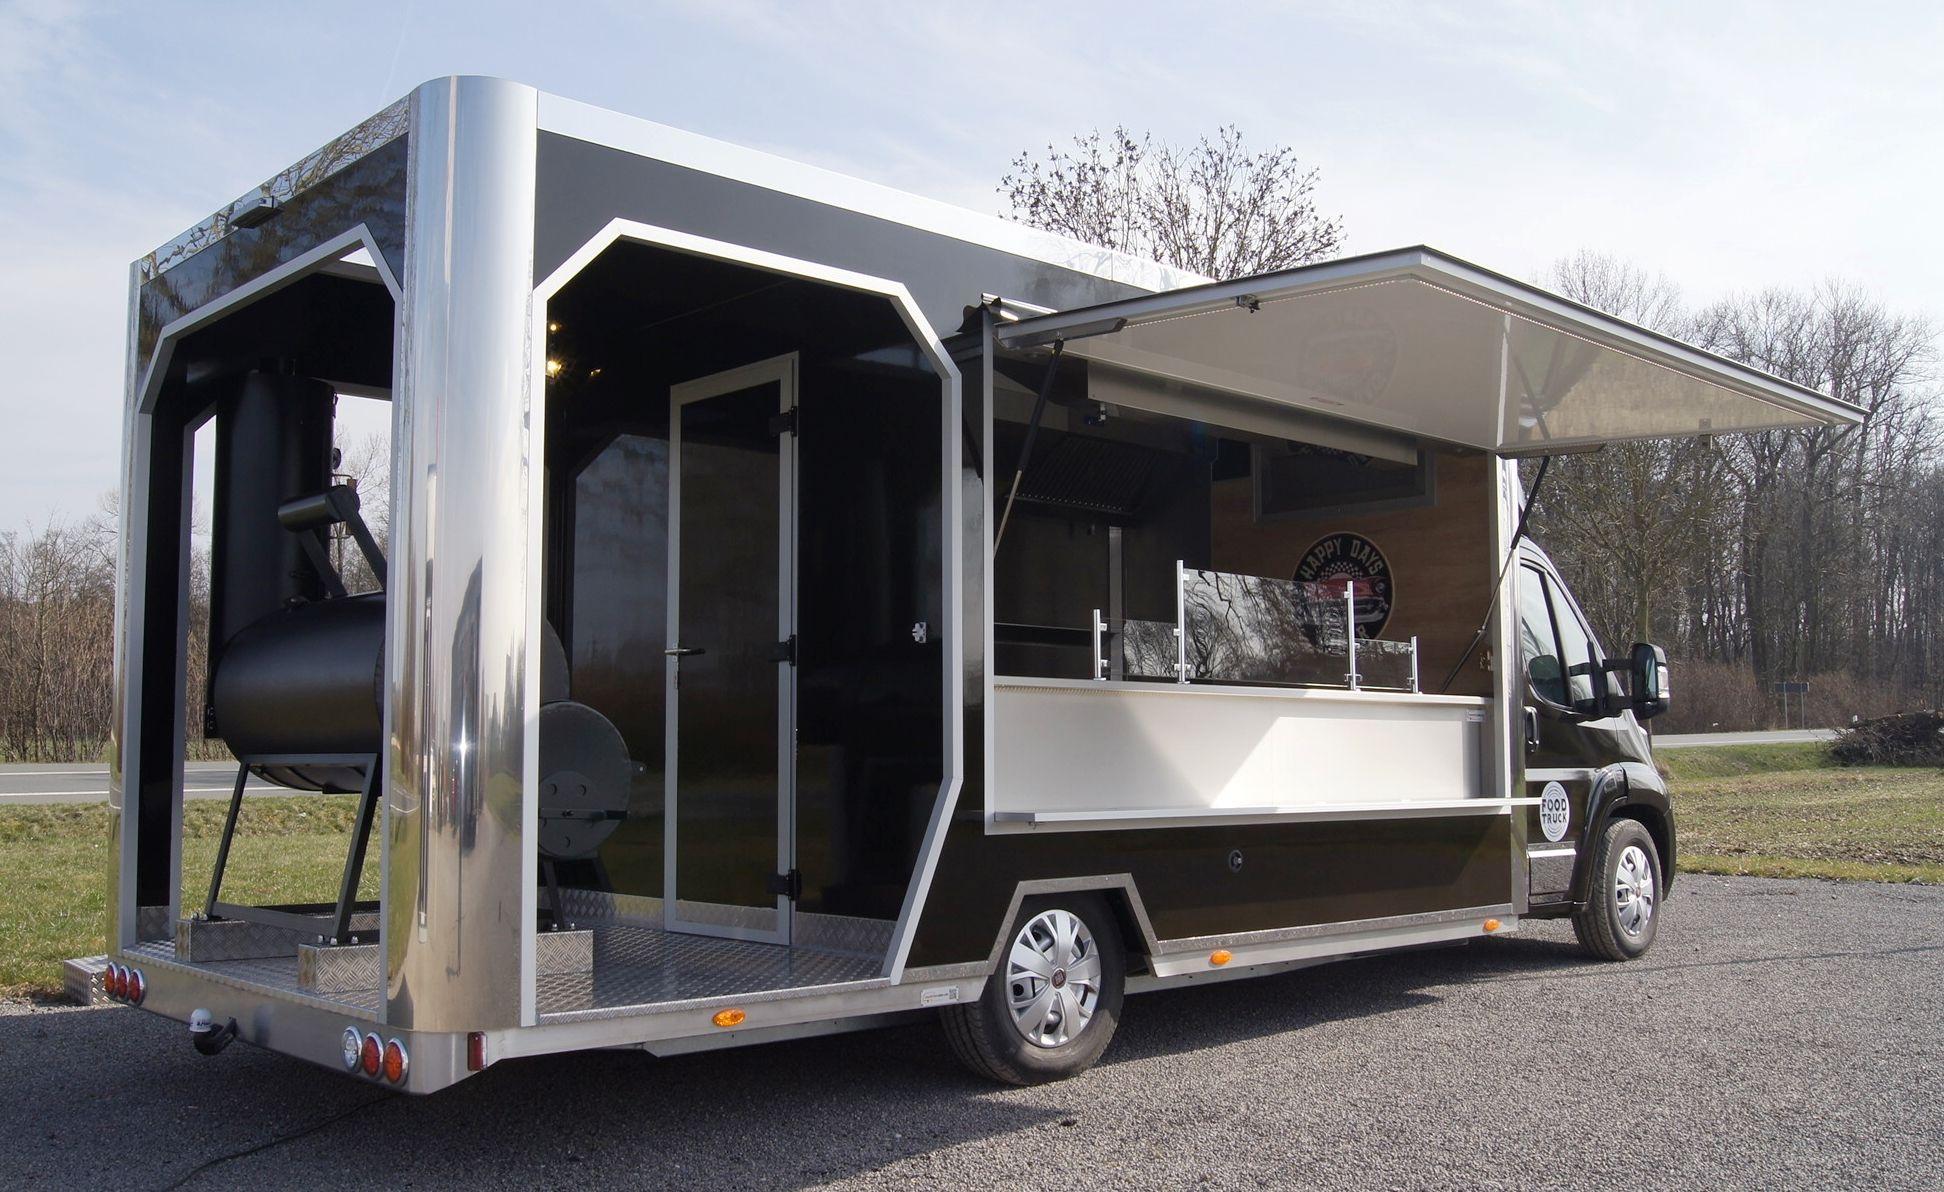 04 veranda food truck n gesch ftsidee food trucks. Black Bedroom Furniture Sets. Home Design Ideas